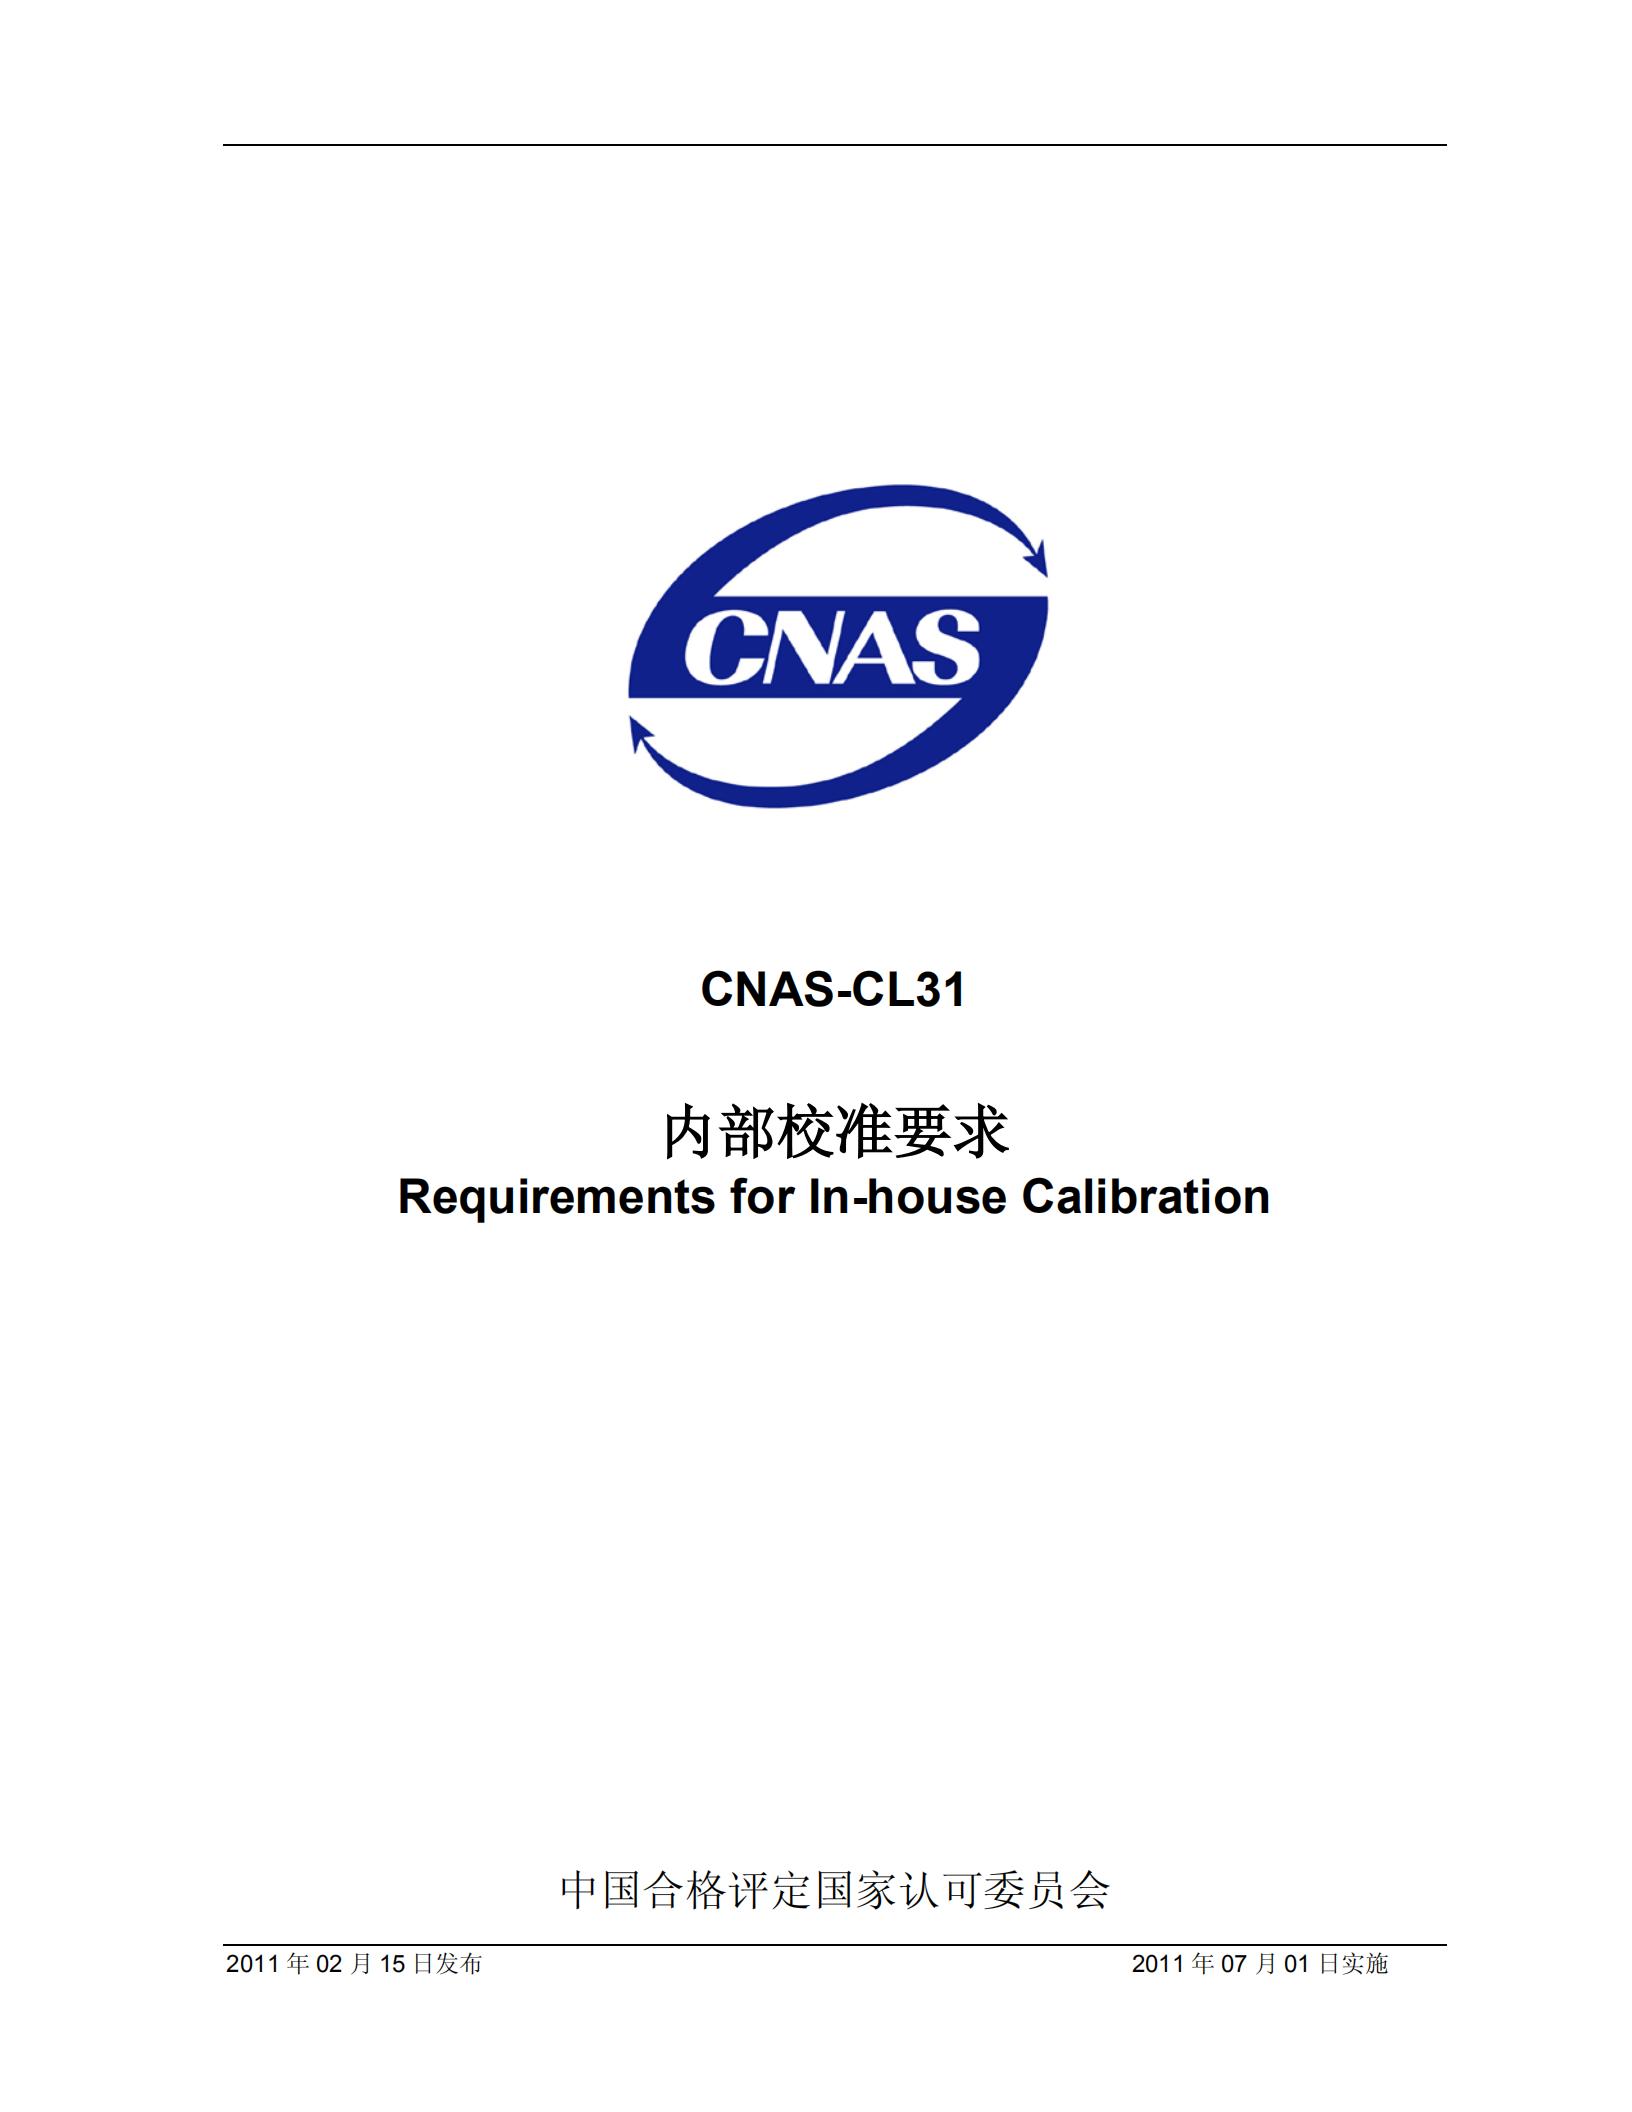 CNAS-CL31内部校准要求_00.png